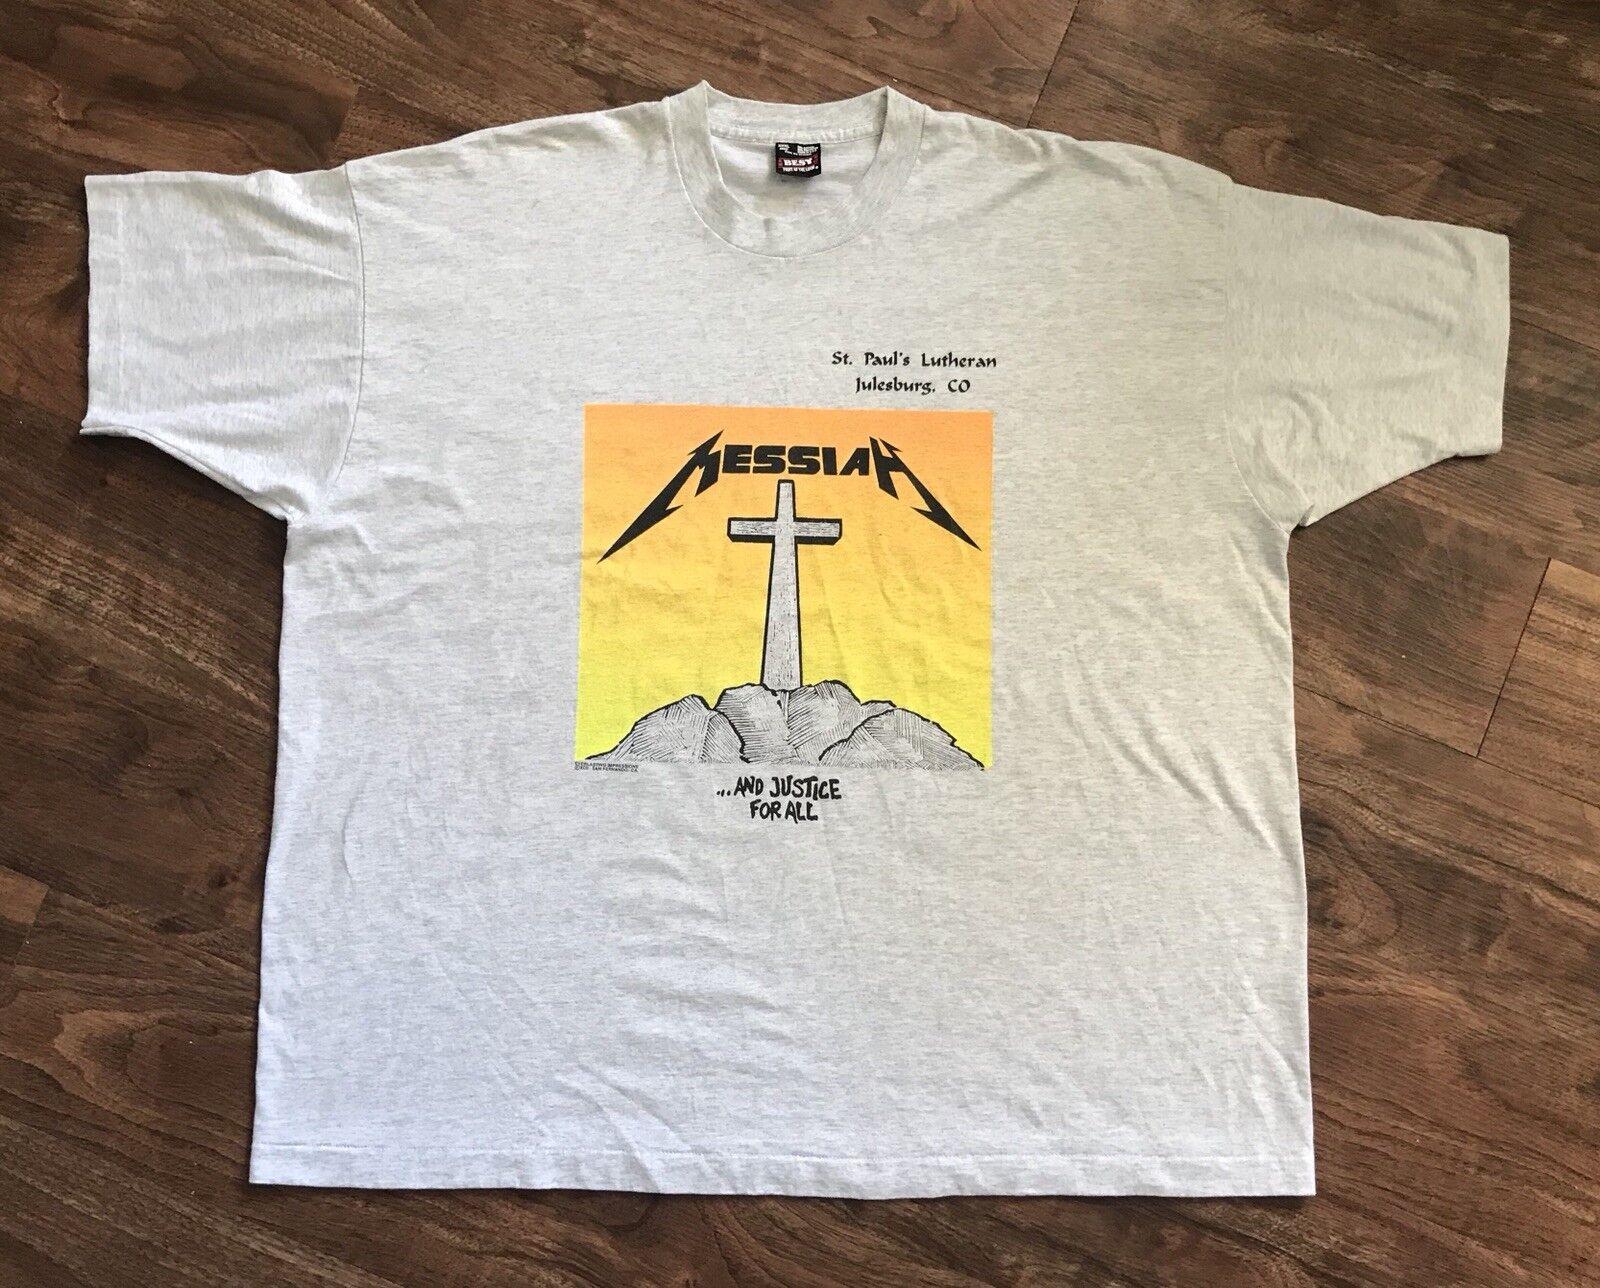 Vintage 90s St Paul Lutheran Church Messiah T-shirt Metal Font 3XL XXXL